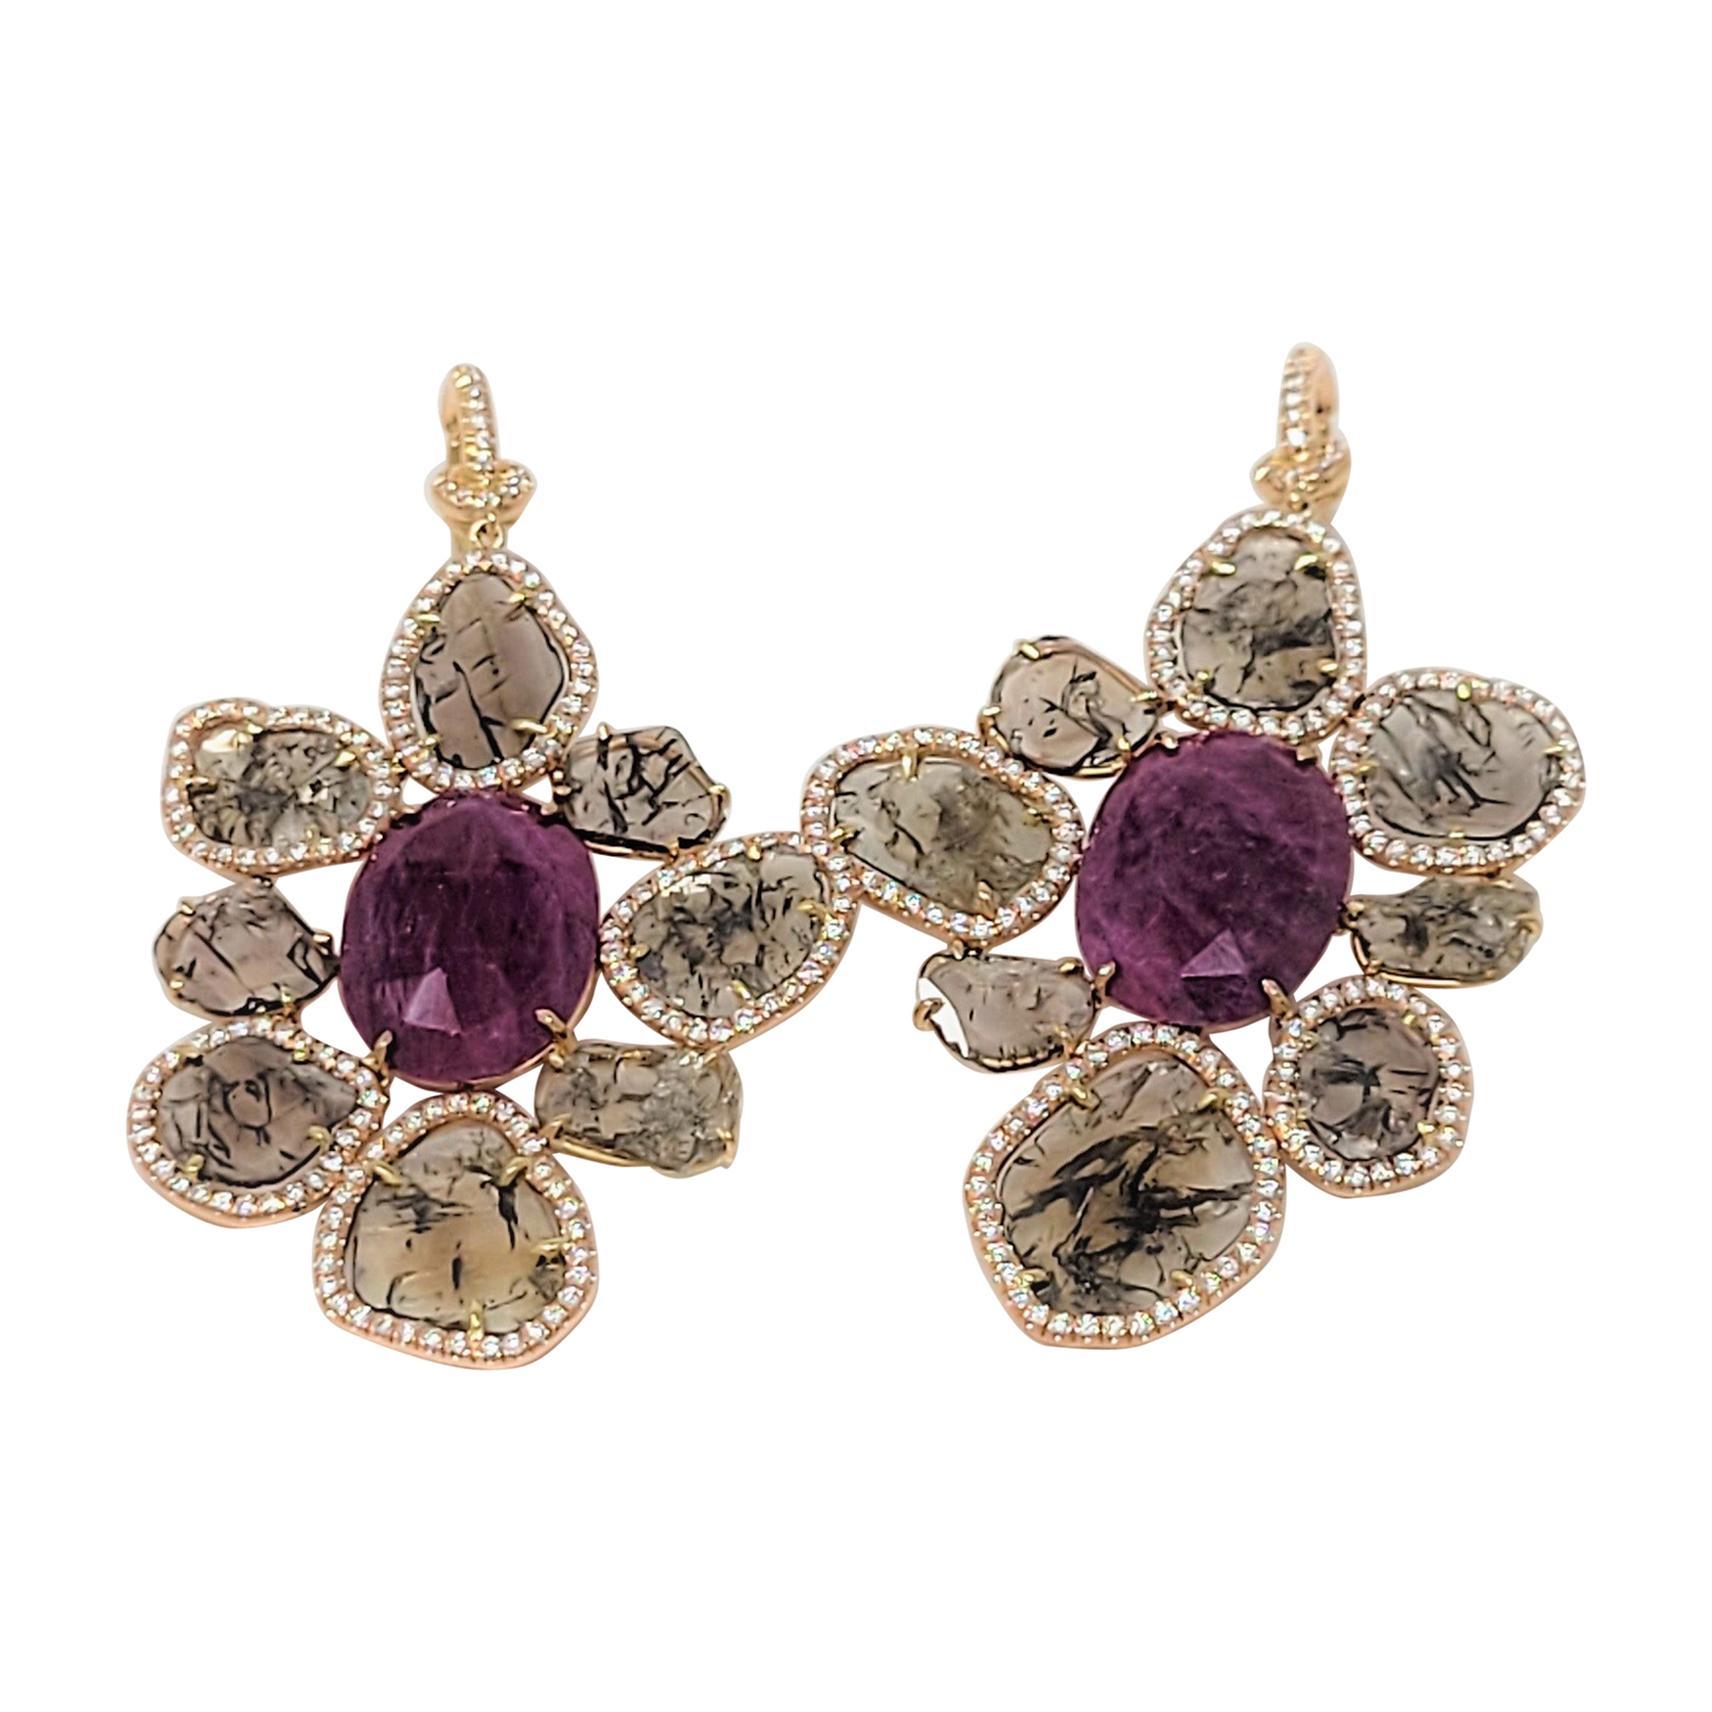 Ruby and Diamond Slice Earrings